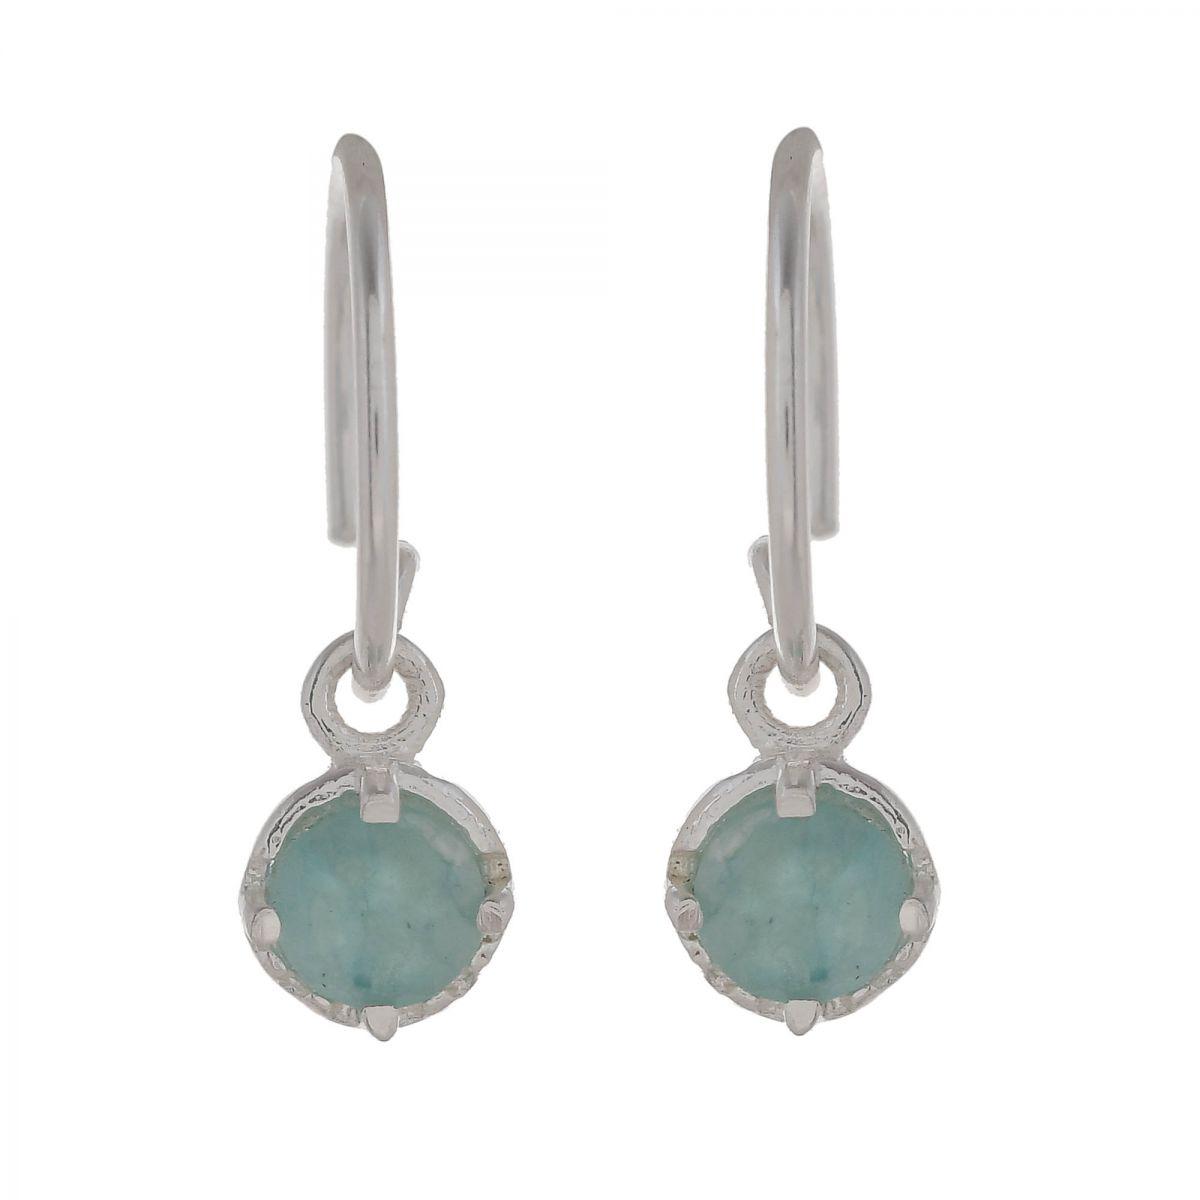 c earring 4mm hanging round amazonite